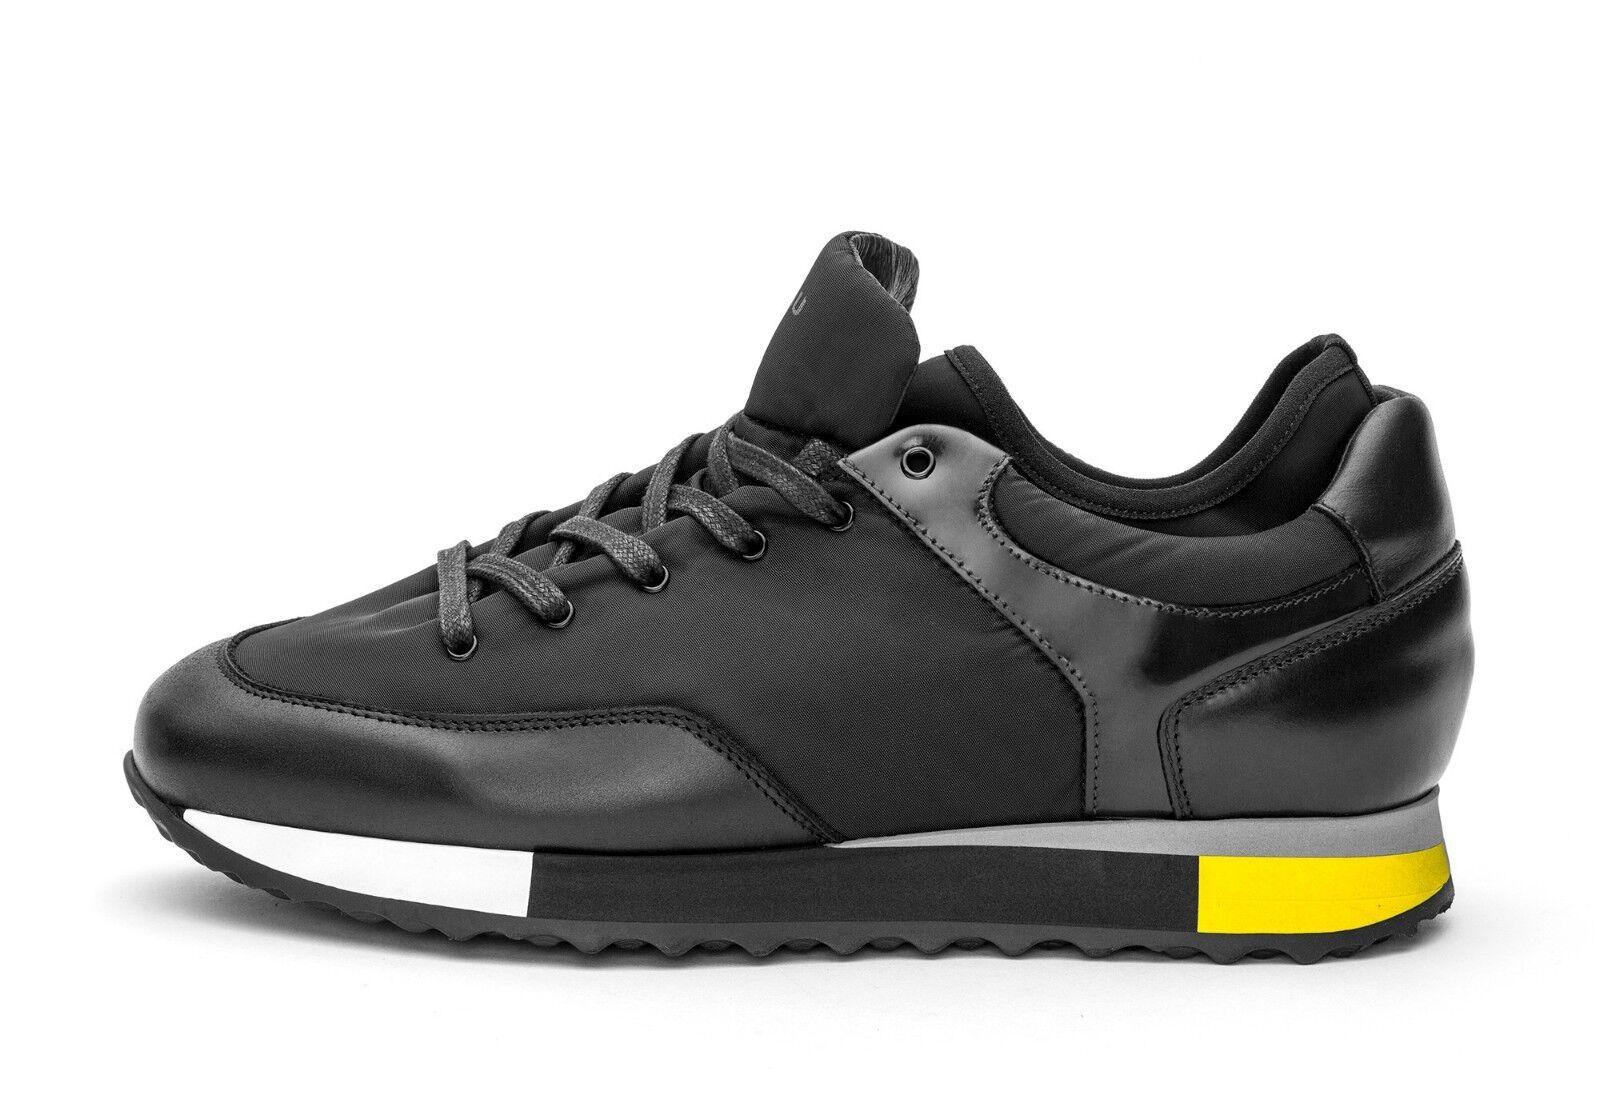 FRAU FRAU FRAU 23M2 sneaker uomo tessuto pelle nero giallo suola gomma made in Italy 50732f